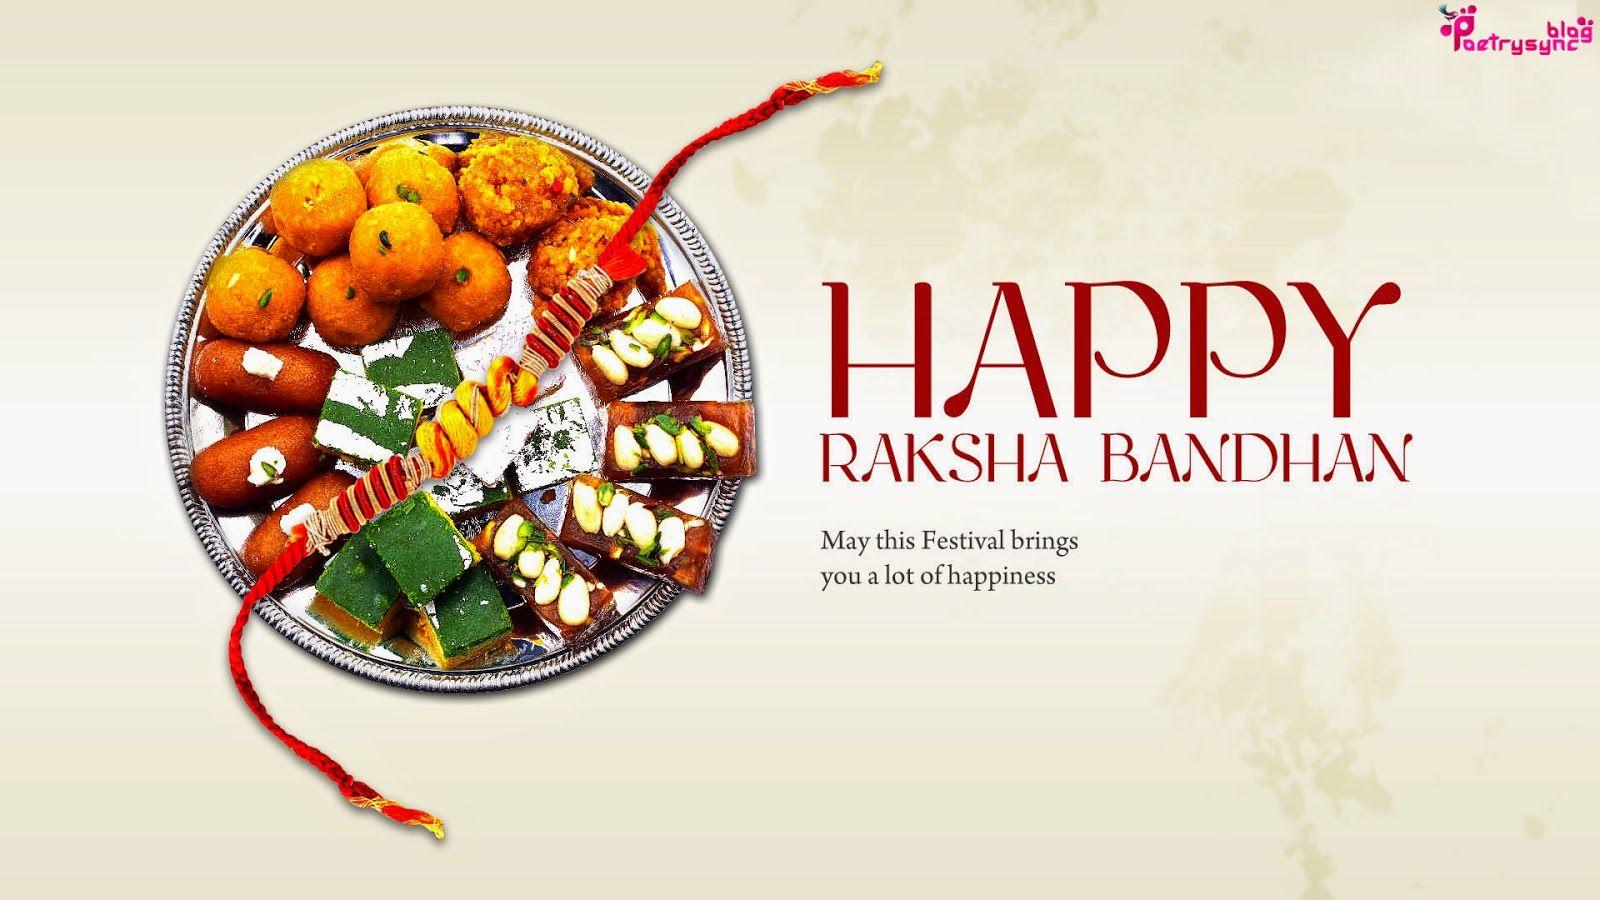 Raksha Bandhan Wallpapers Download Raksha Bandhan Wallpapers For